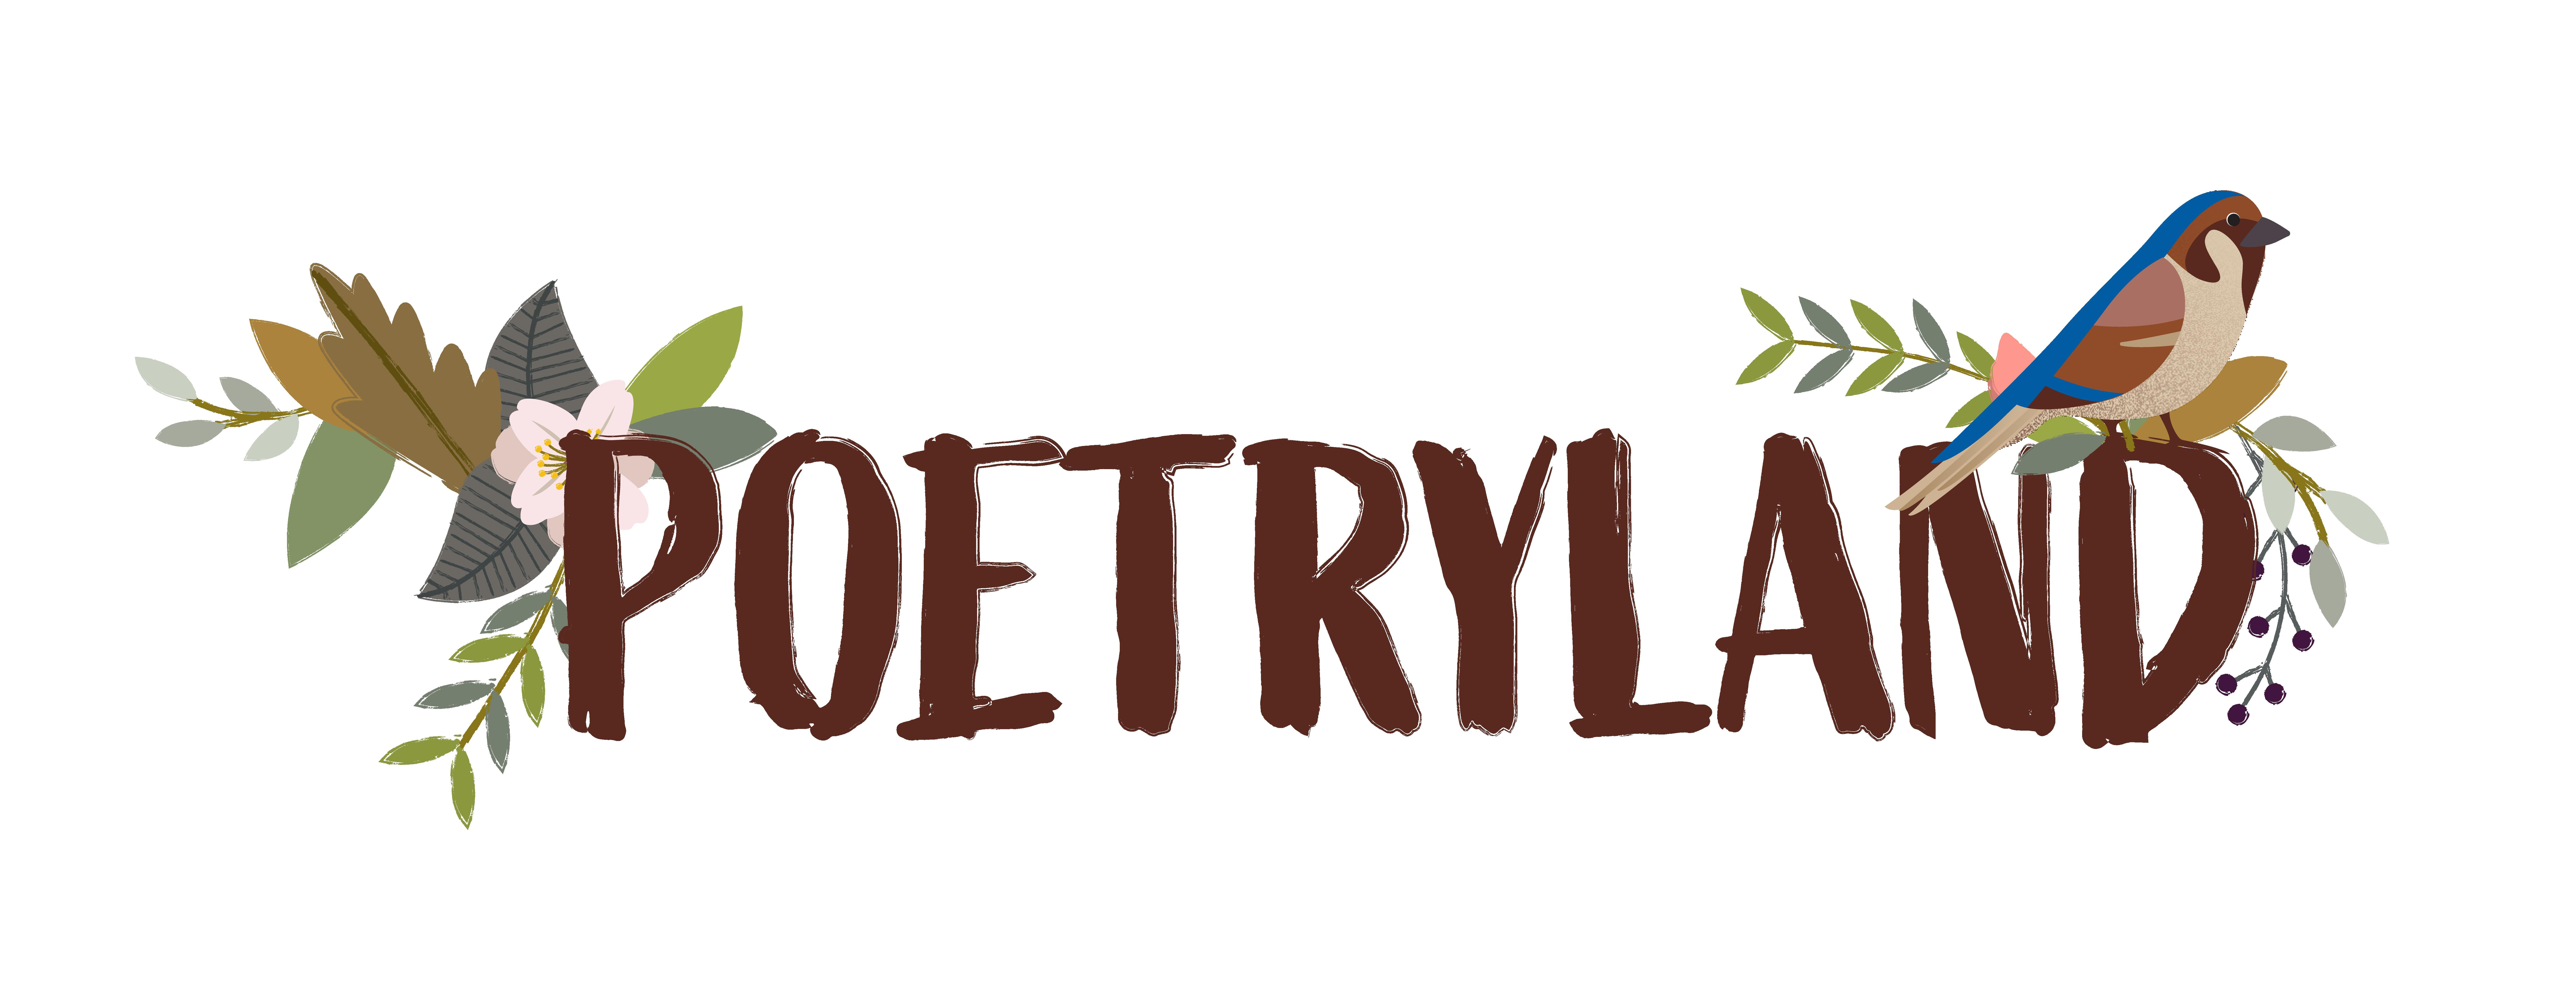 Poetryland